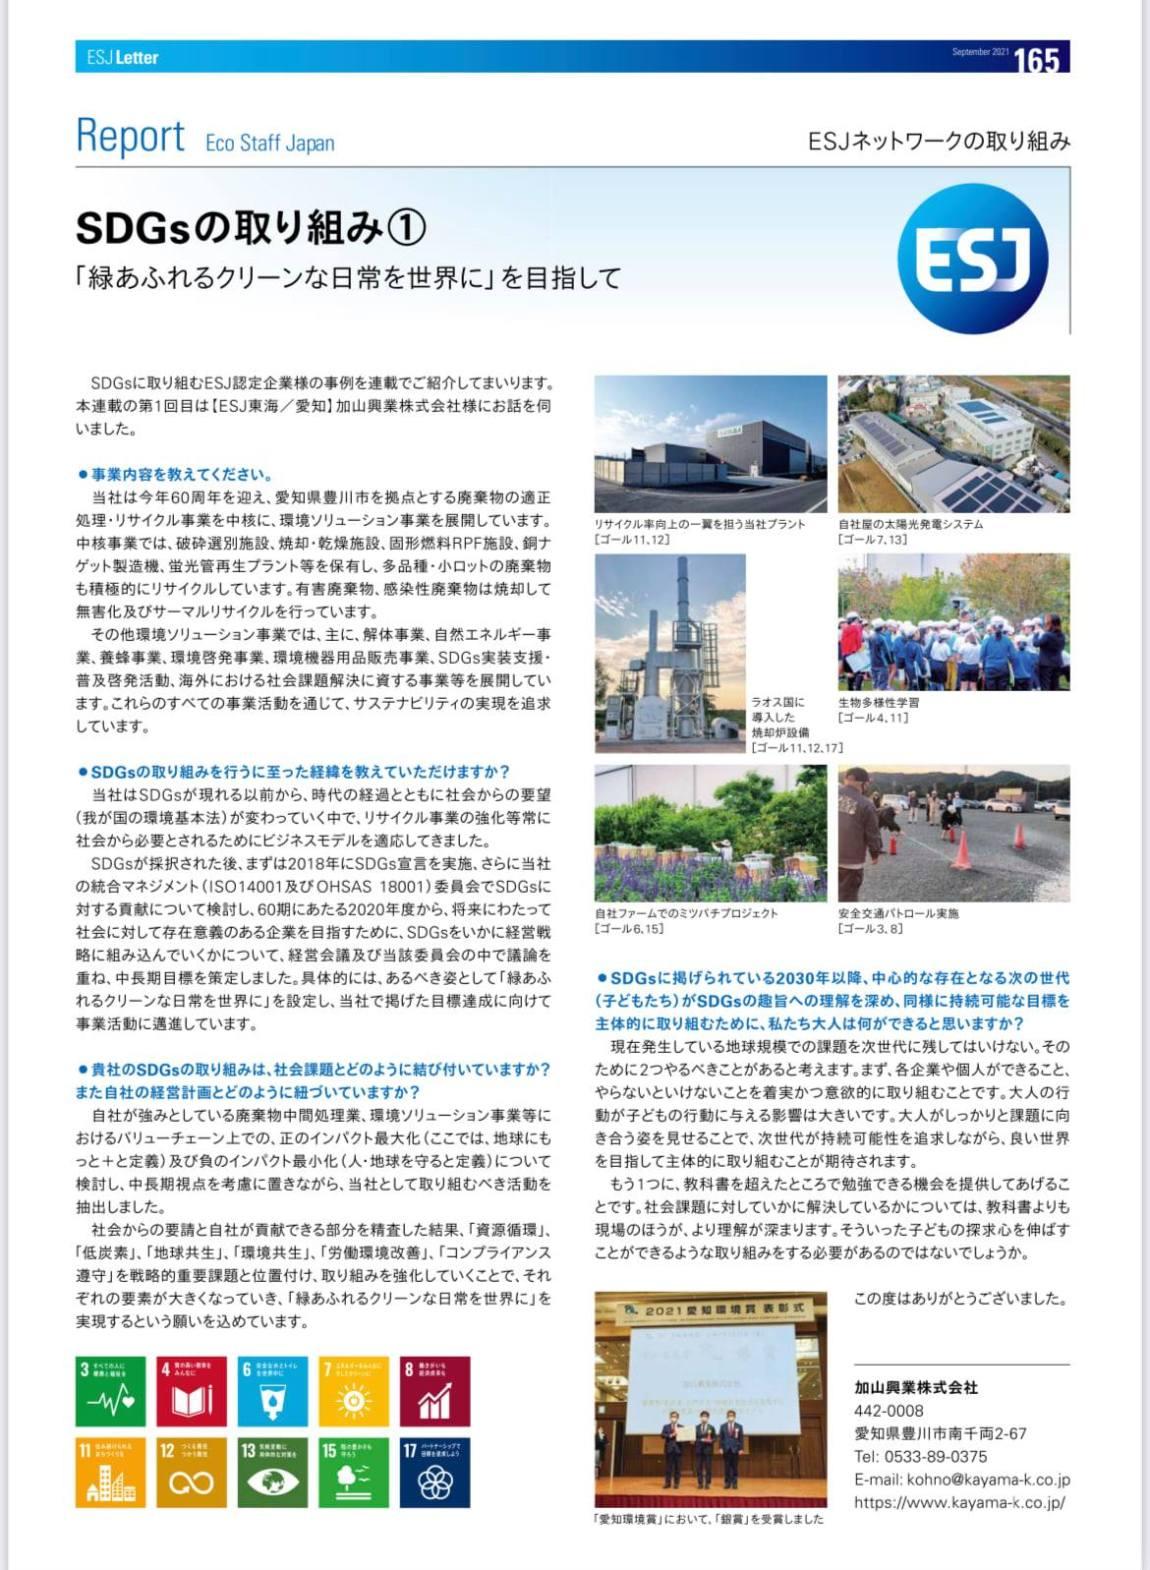 ESJ letter165号 エコスタッフ・ジャパン 産廃処理・リサイクル事業者